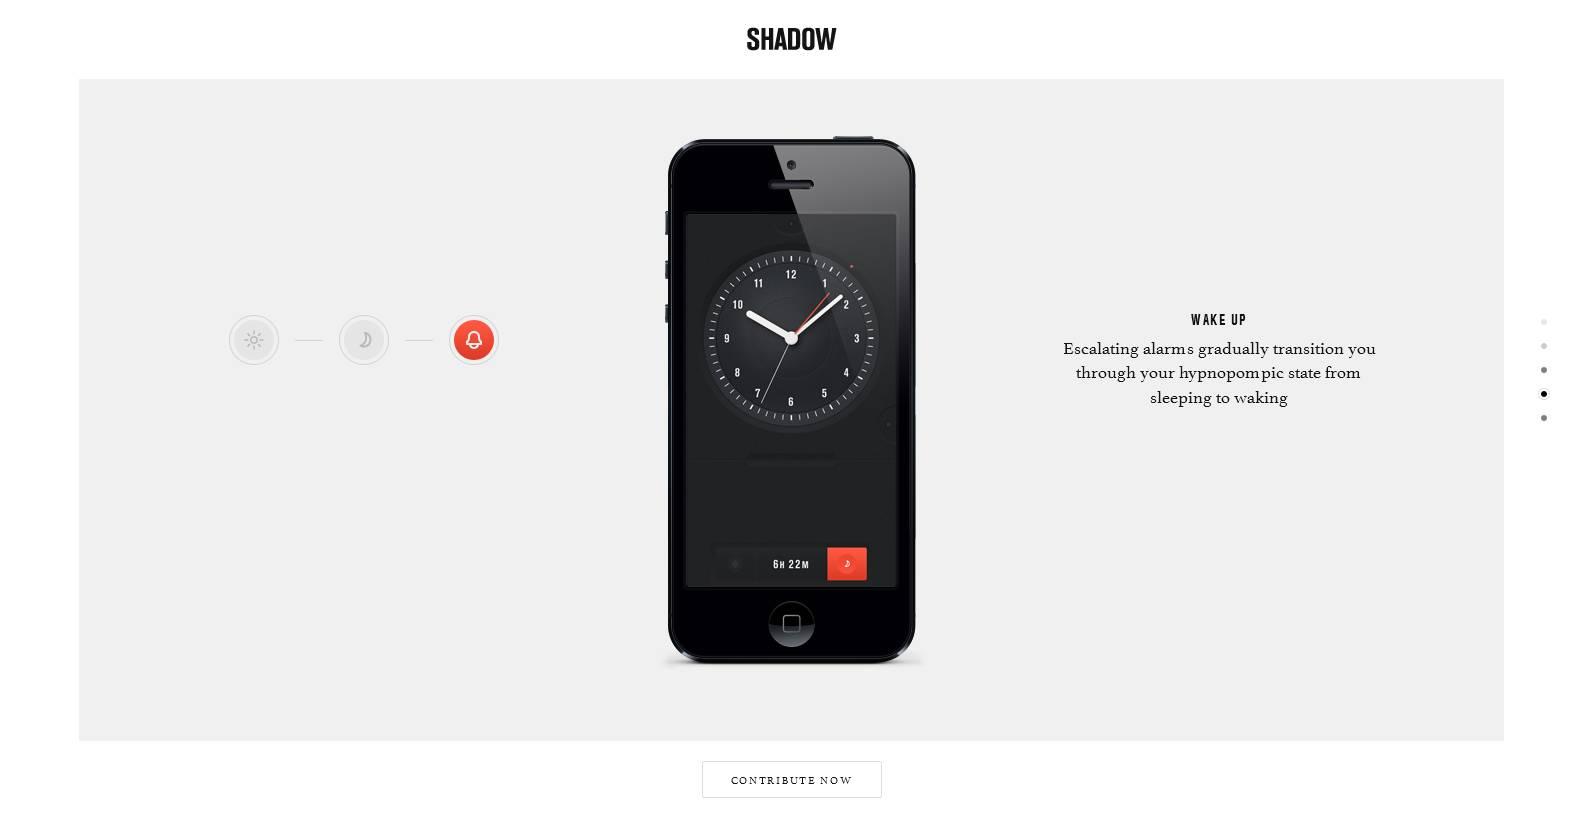 #1205 - 'SHADOW I Community of Dreamers' - discovershadow_com